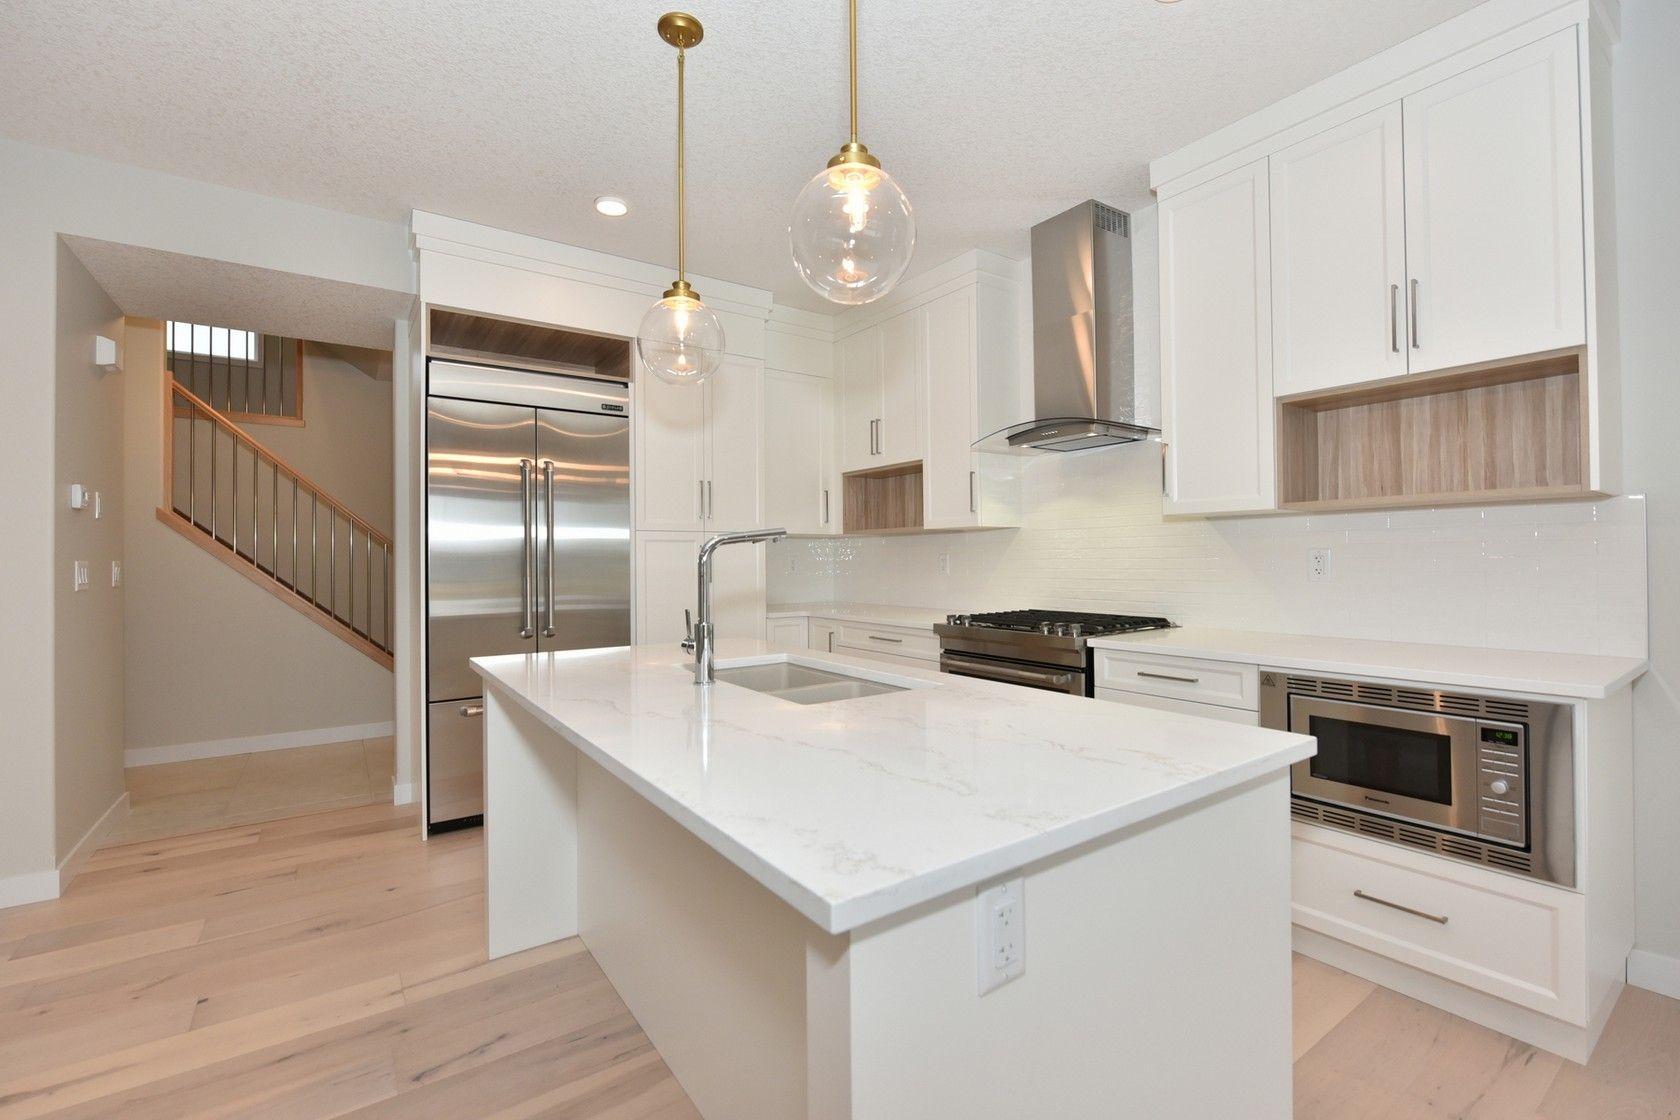 a goegeous strato quartz island home additions quartz kitchen kitchen remodel on kitchen island ideas white quartz id=70972